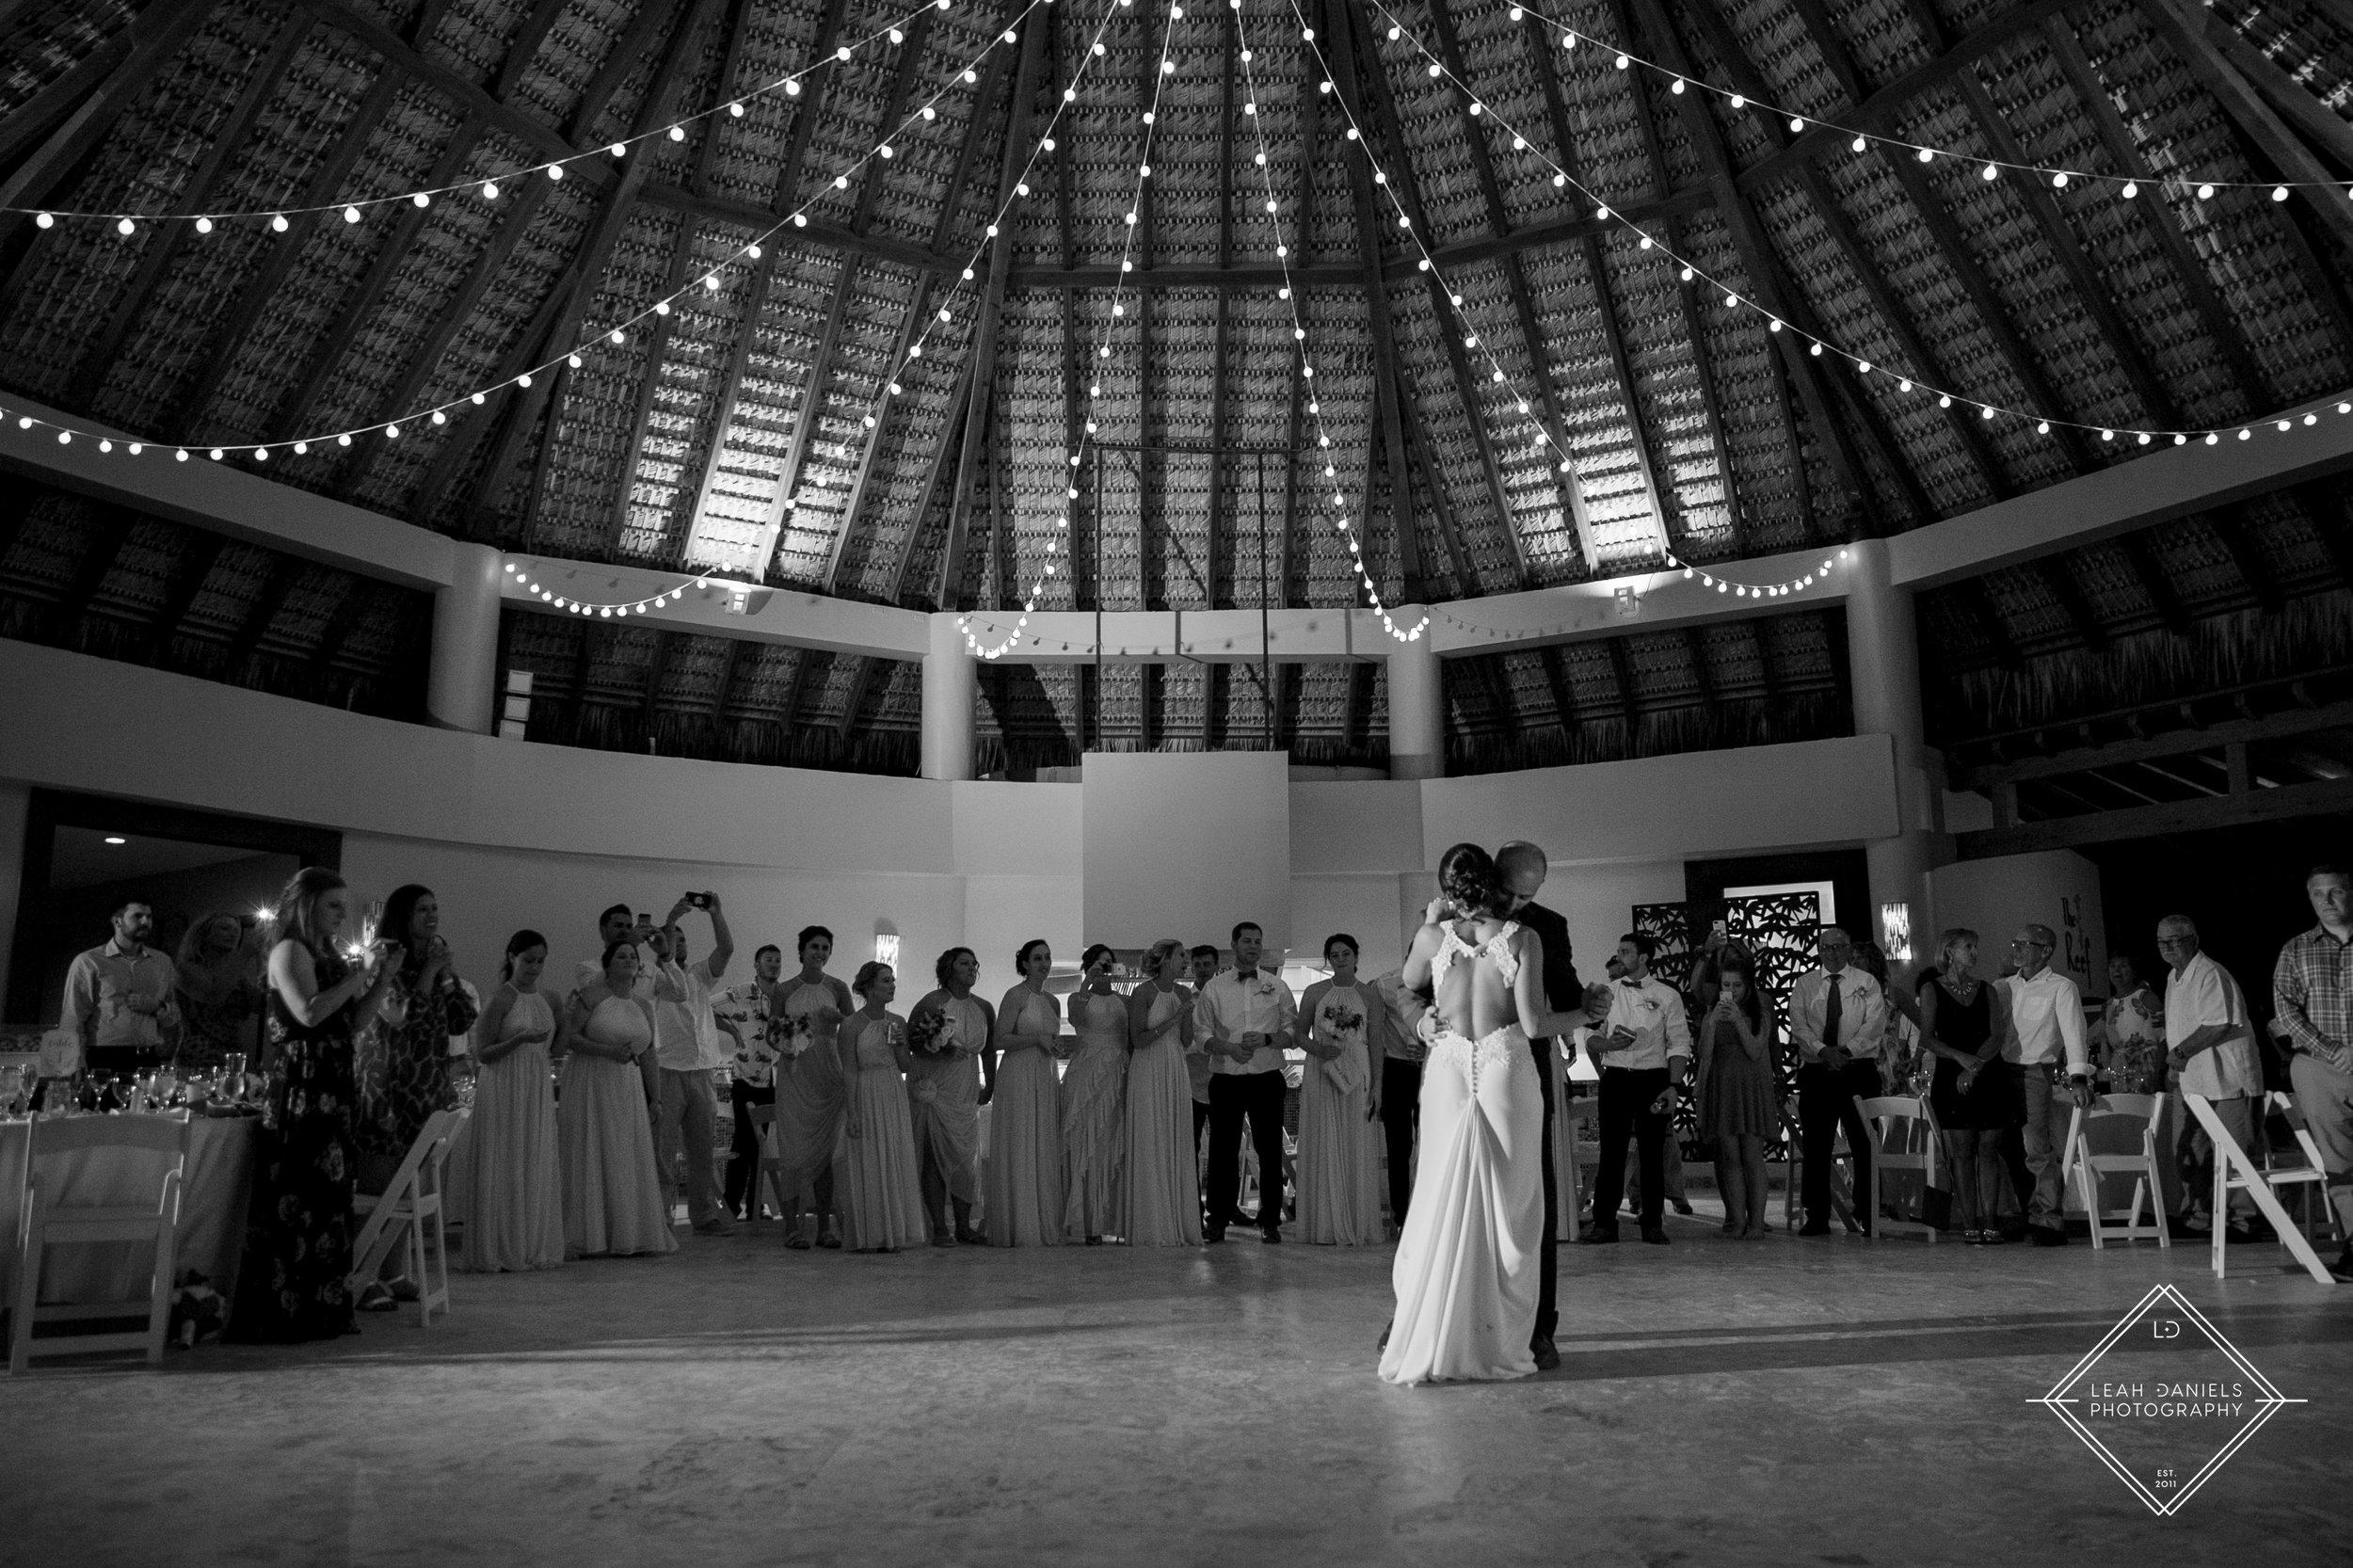 NOW Larimar Destination Wedding; The Bride and Groom first dance